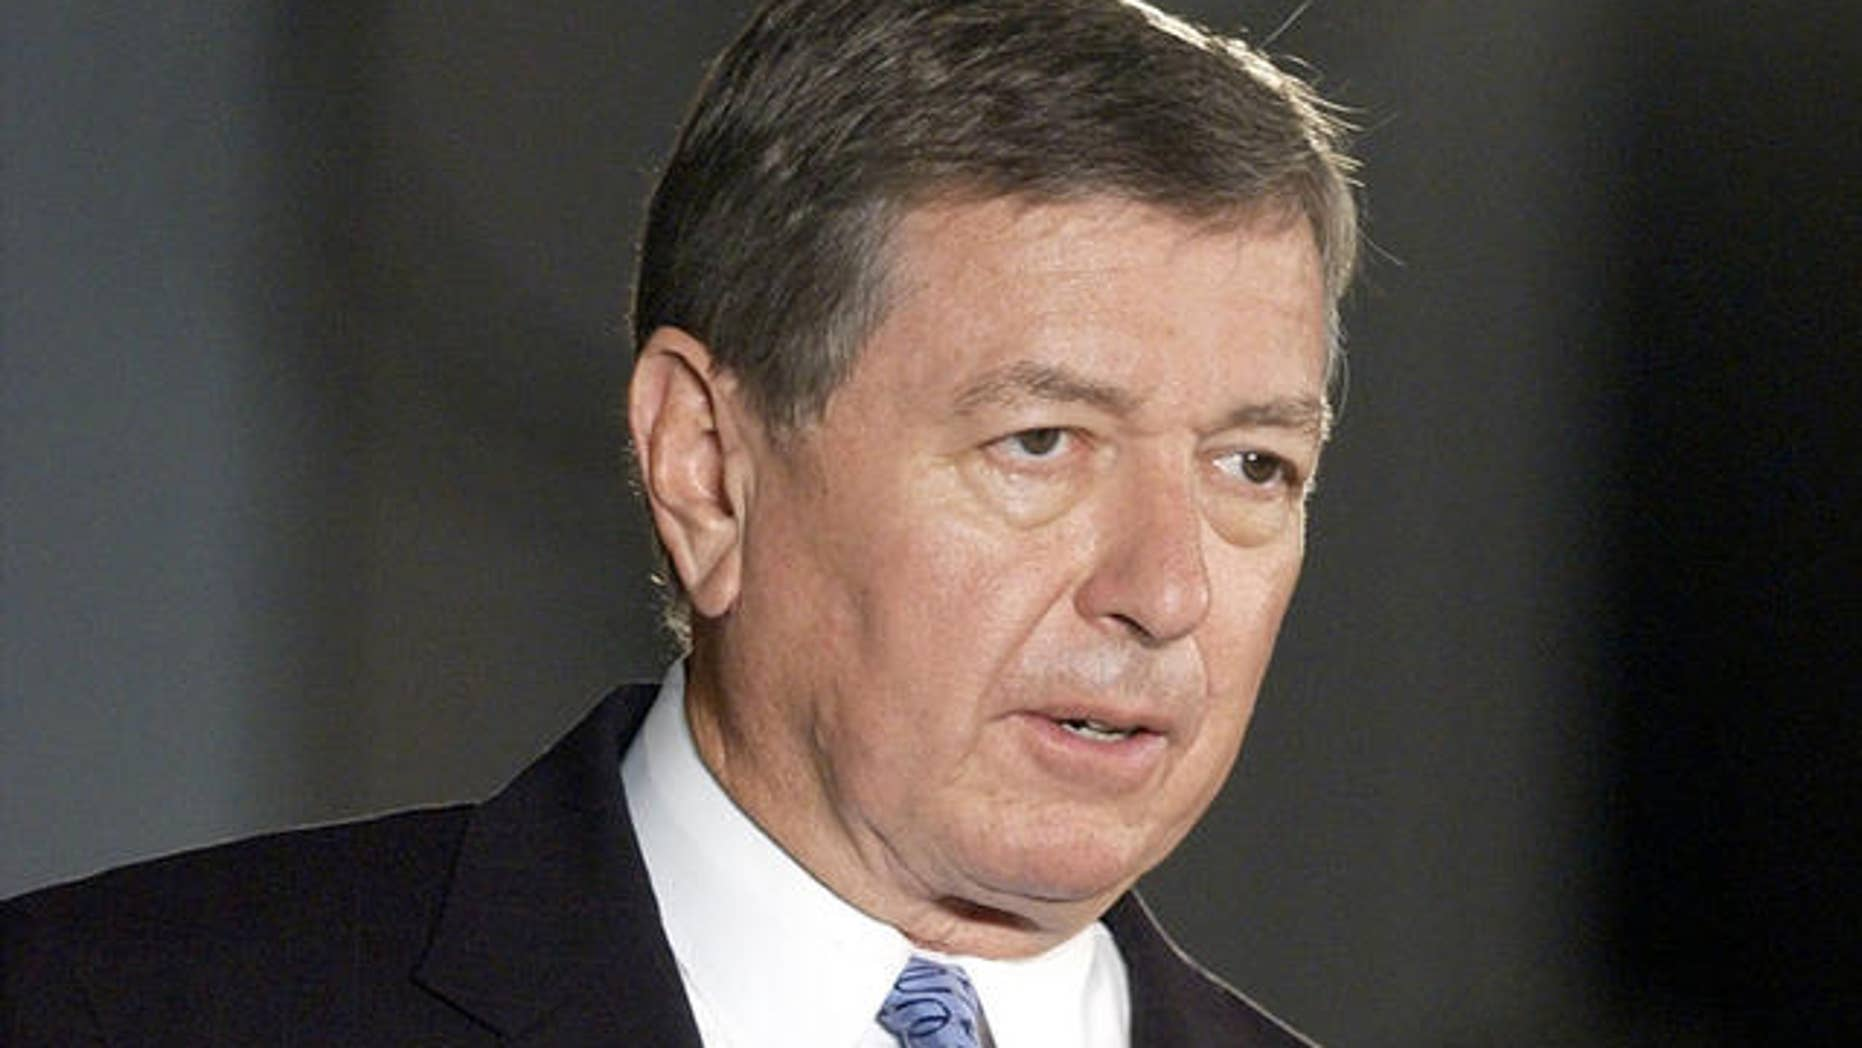 Former Attorney General John Ashcroft